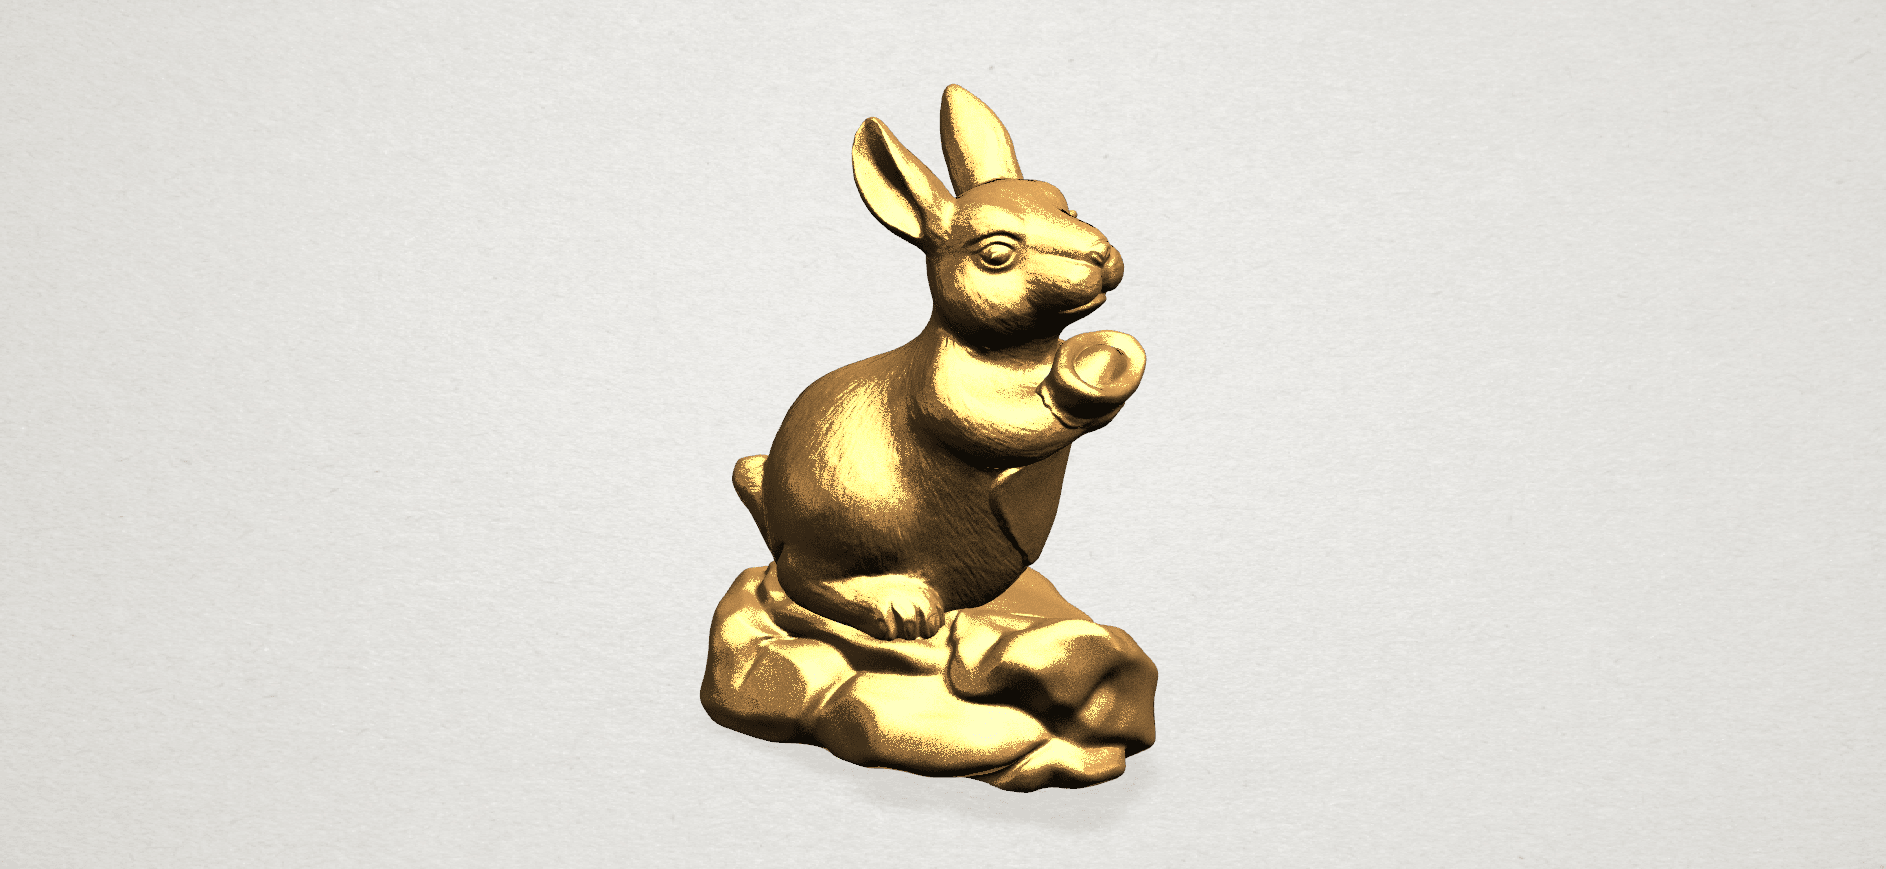 Chinese Horoscope04-02.png Télécharger fichier STL gratuit Horoscope Chinois 04 Lapin • Design à imprimer en 3D, GeorgesNikkei